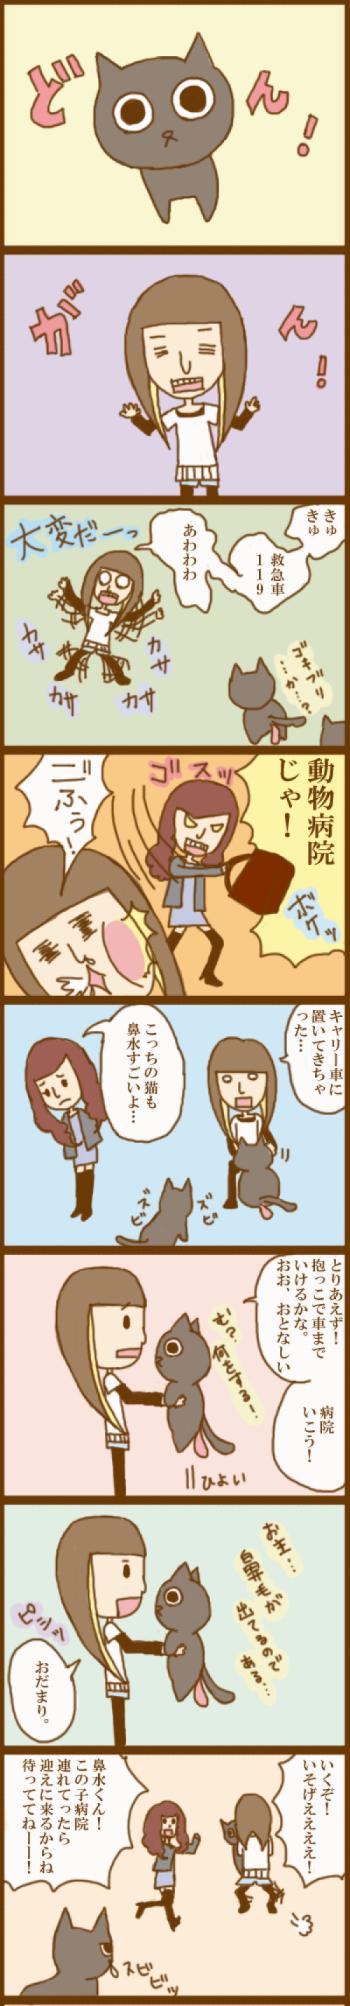 f:id:suzuokayu:20201030091647j:plain